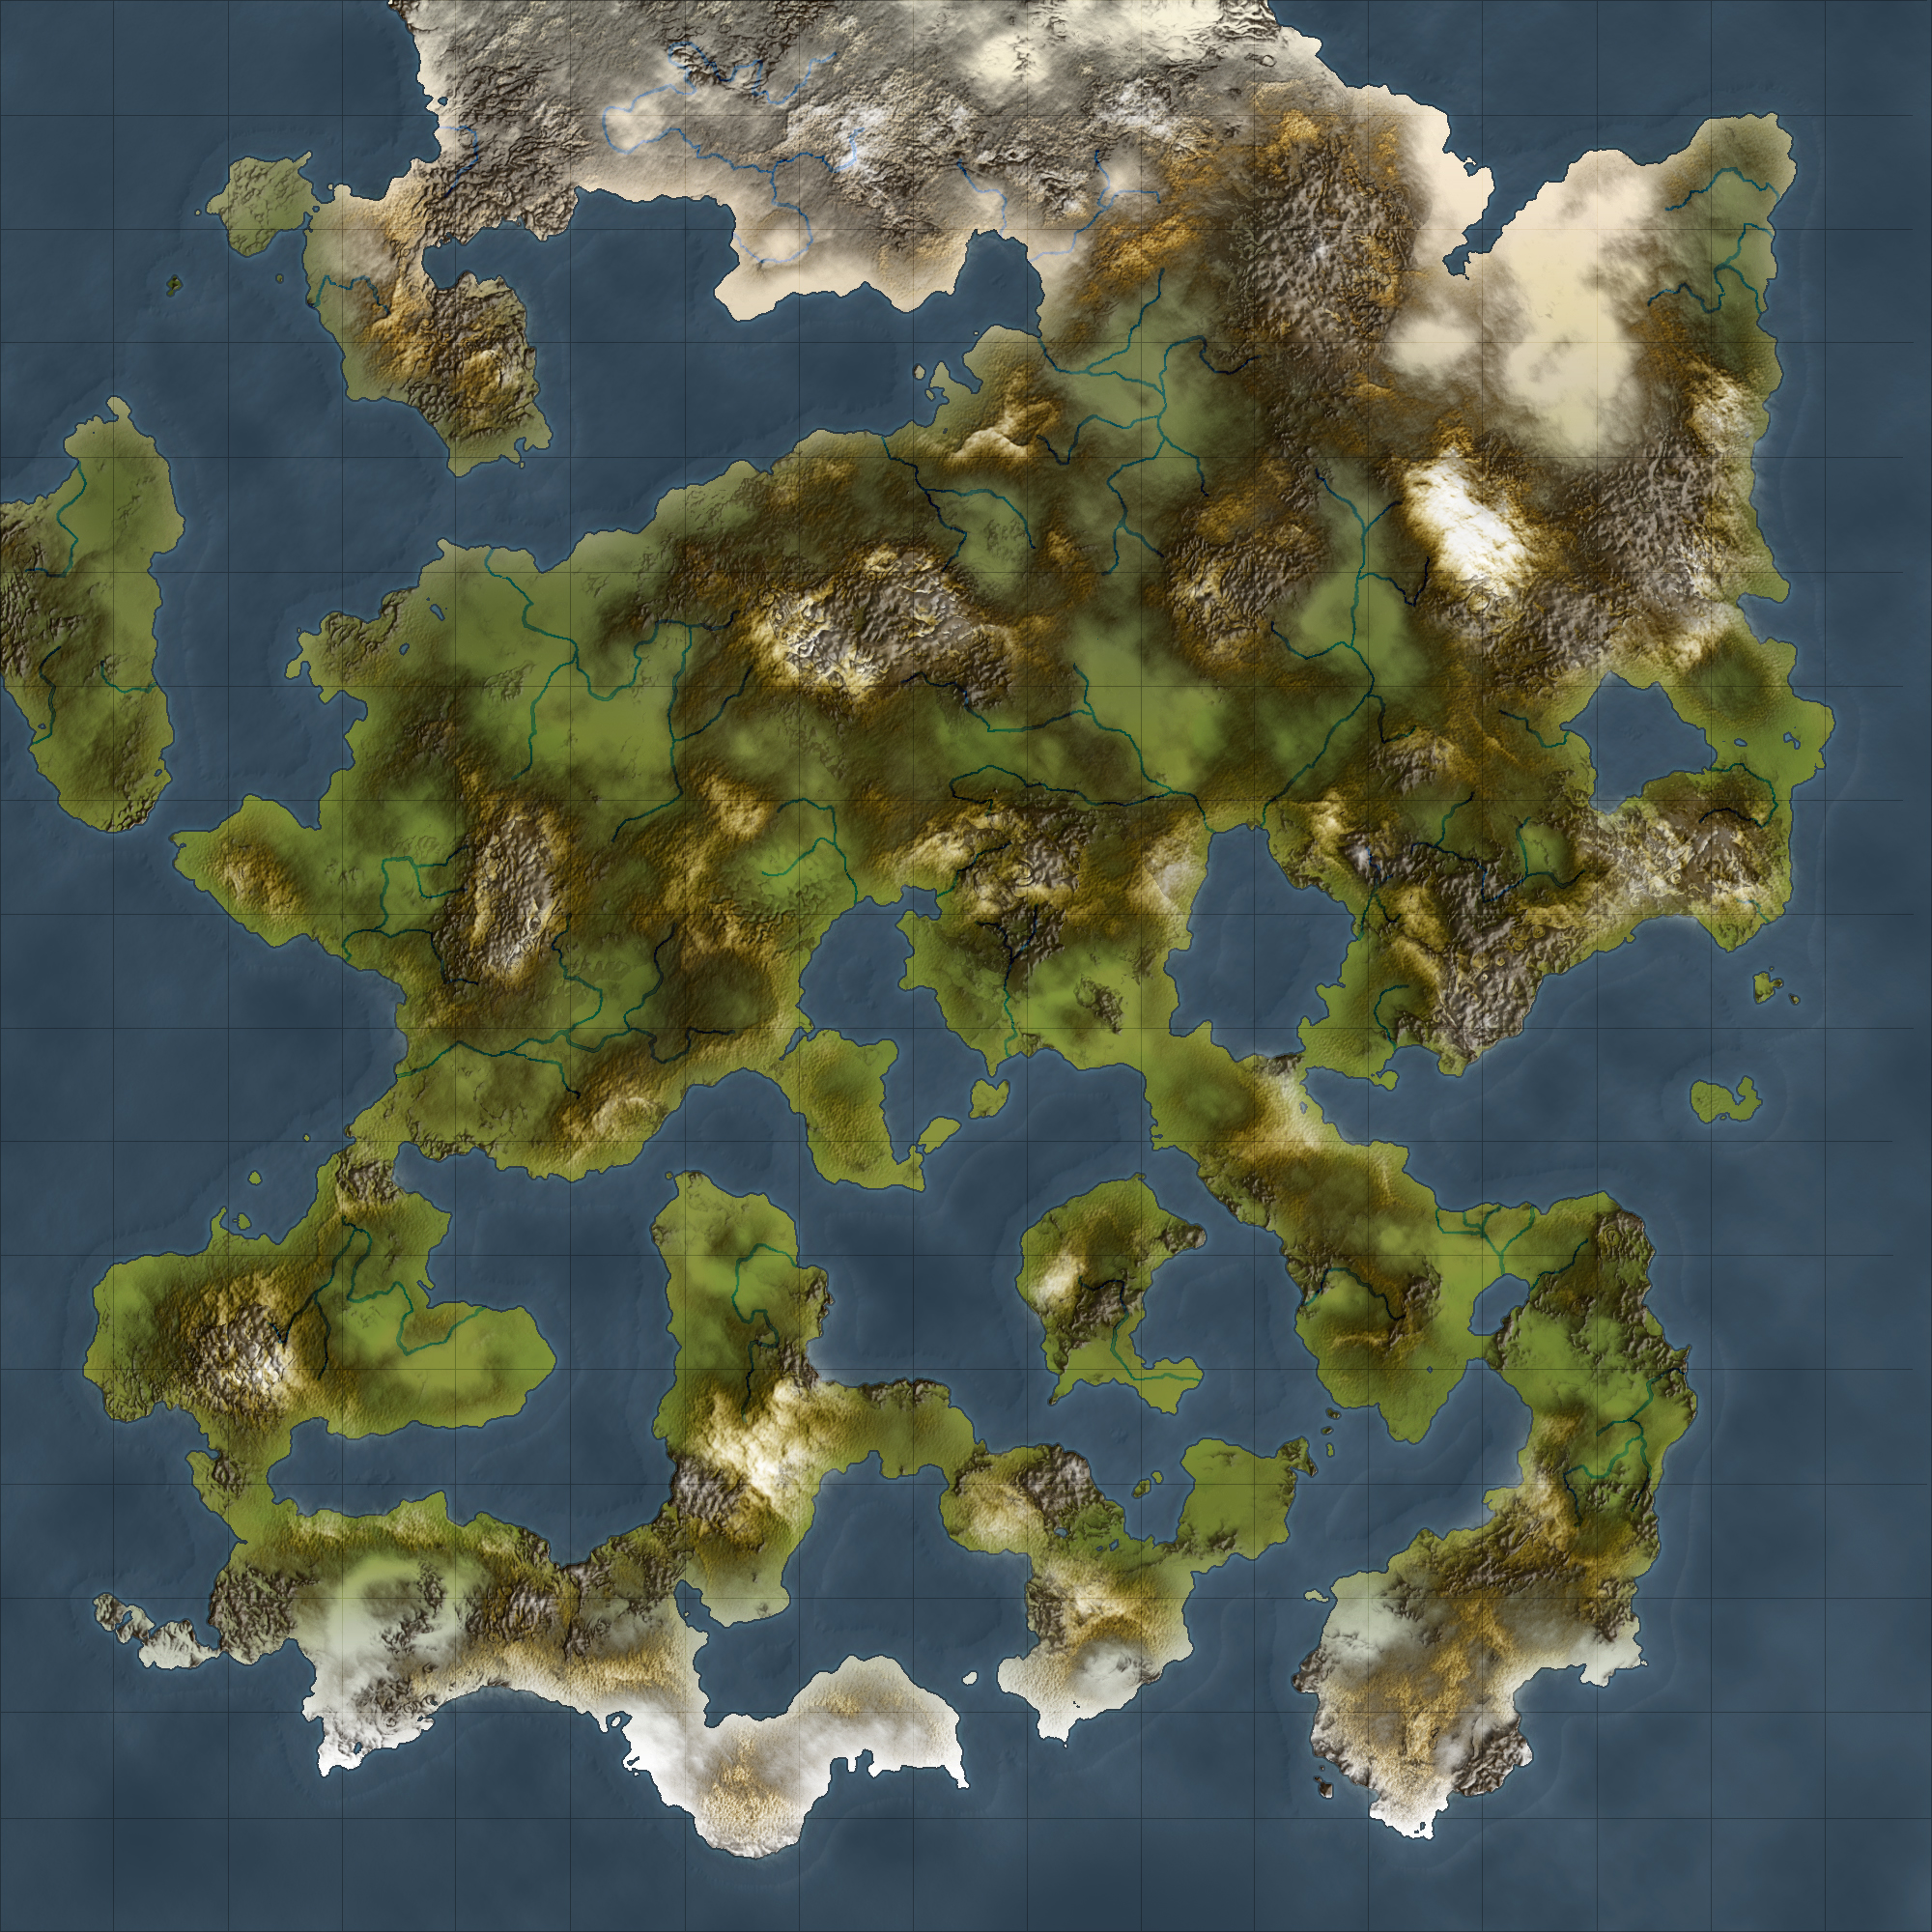 Practice Atlas style